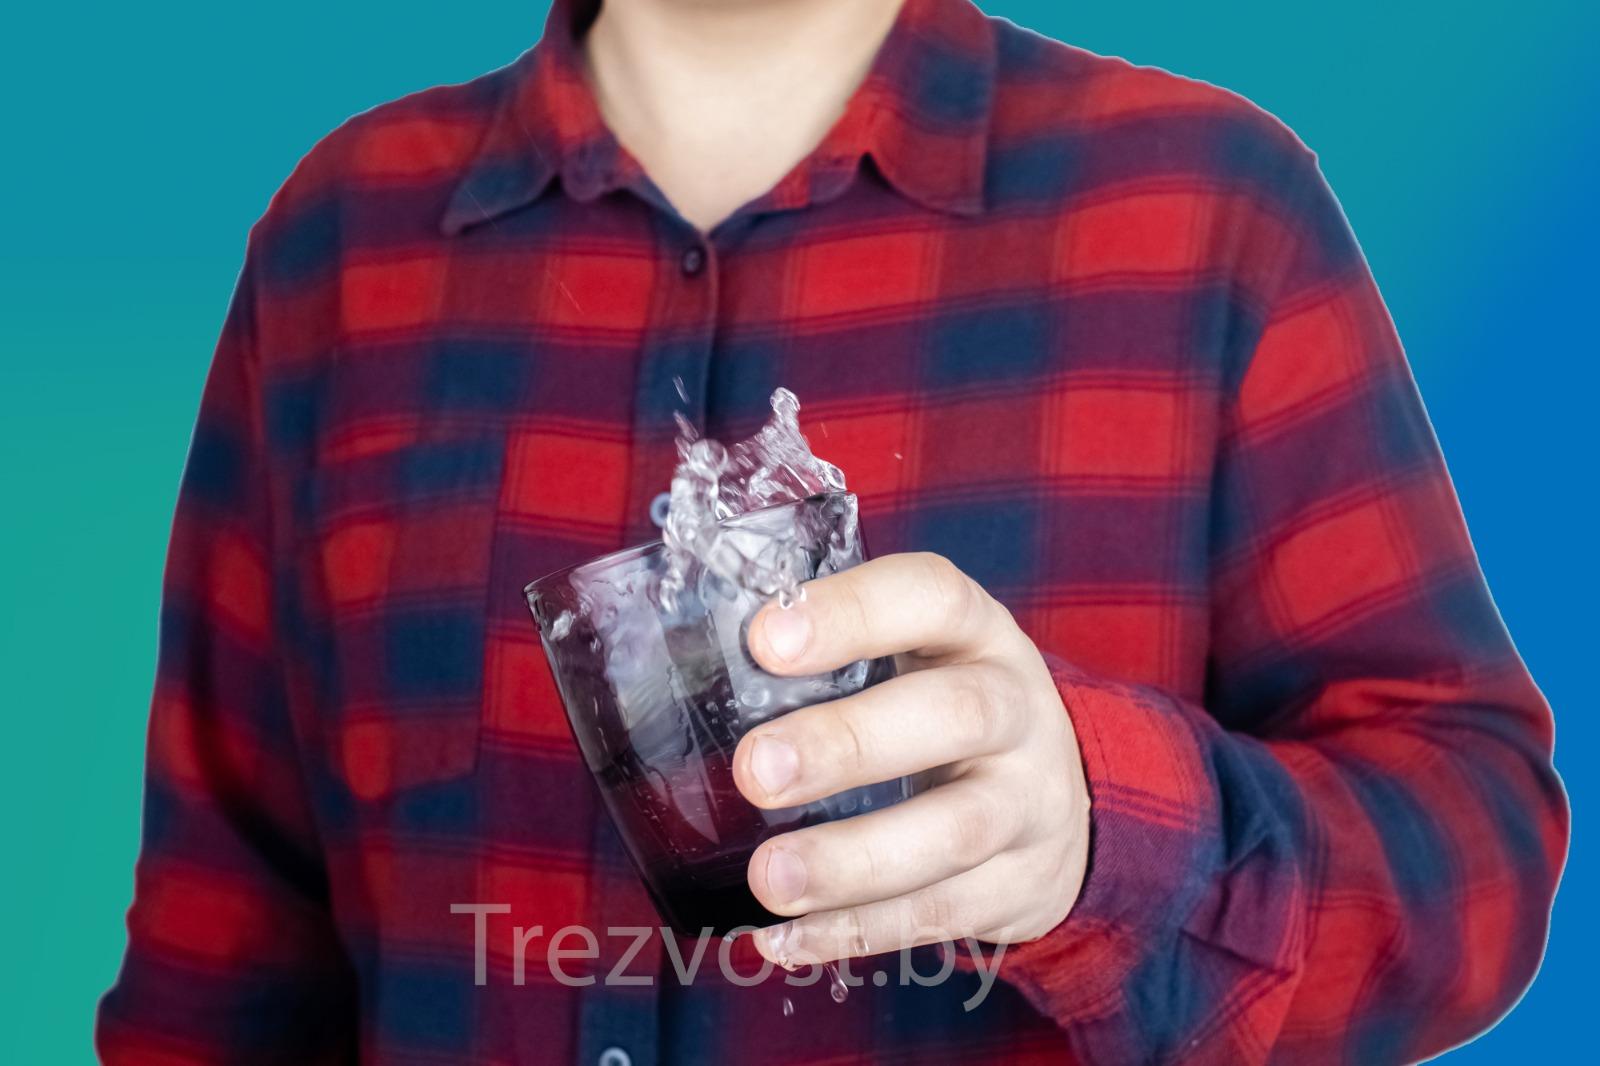 Тремор рук при алкоголизме